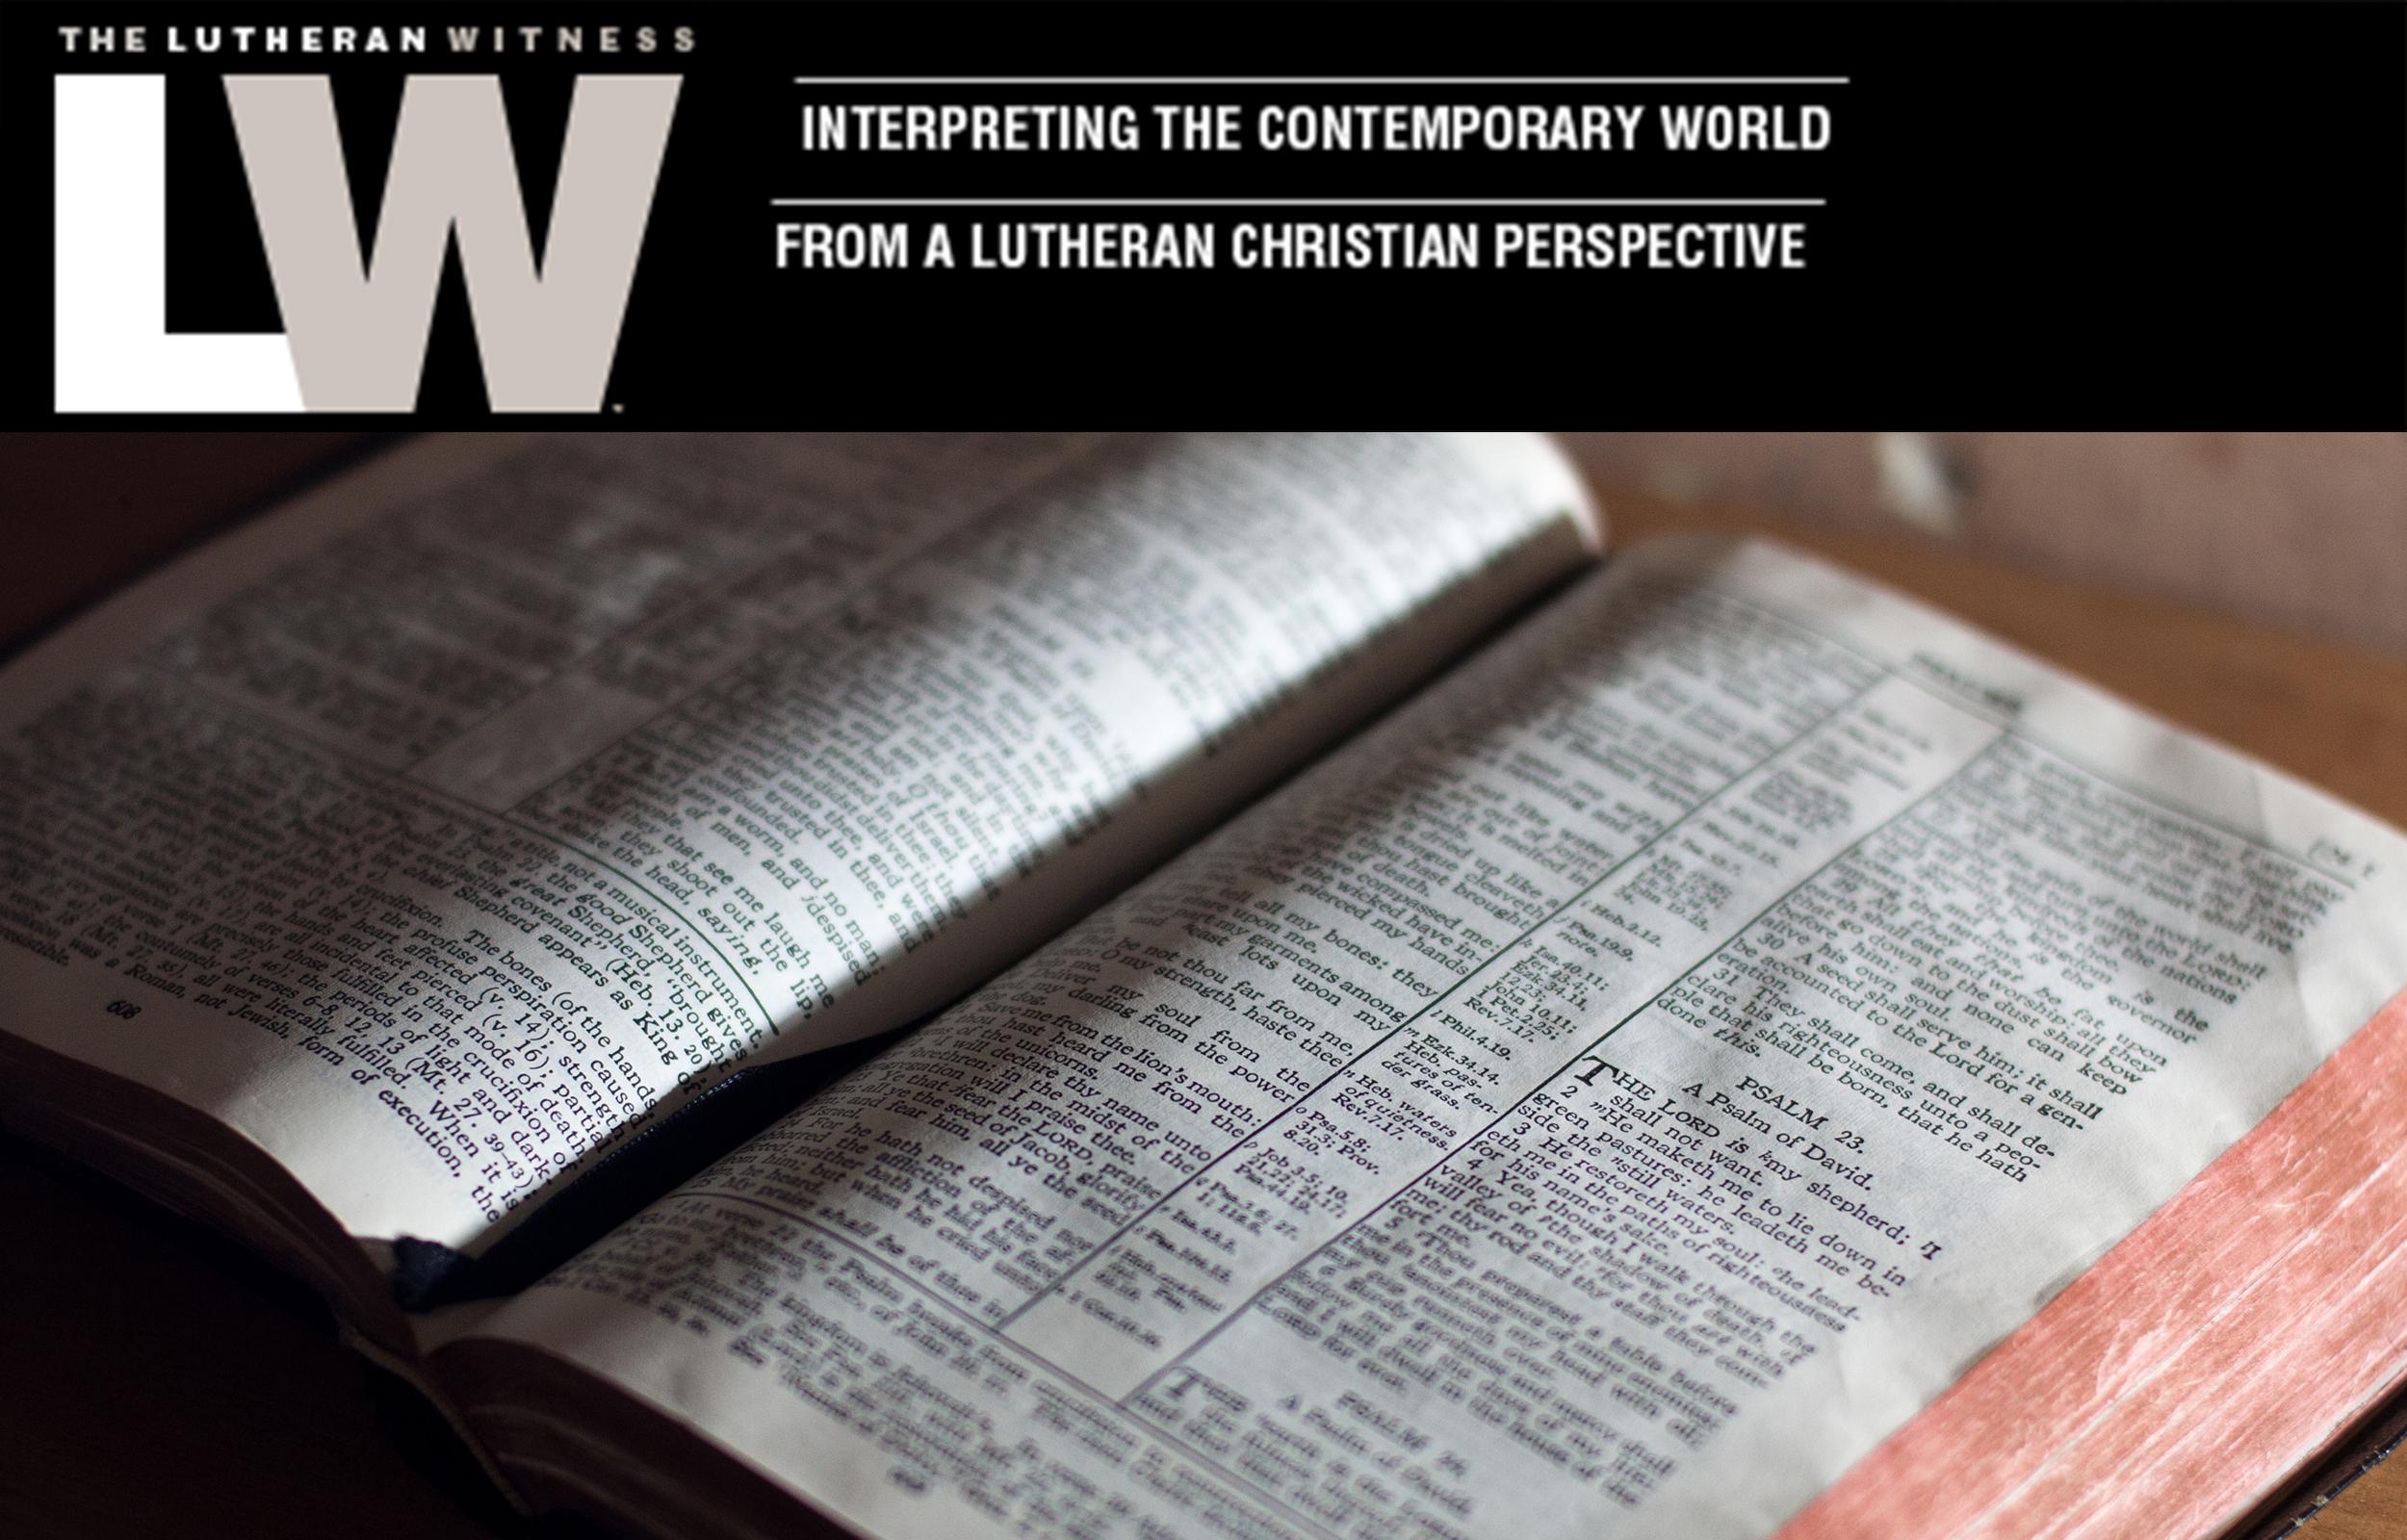 Adriane Heins Lutheran Witness